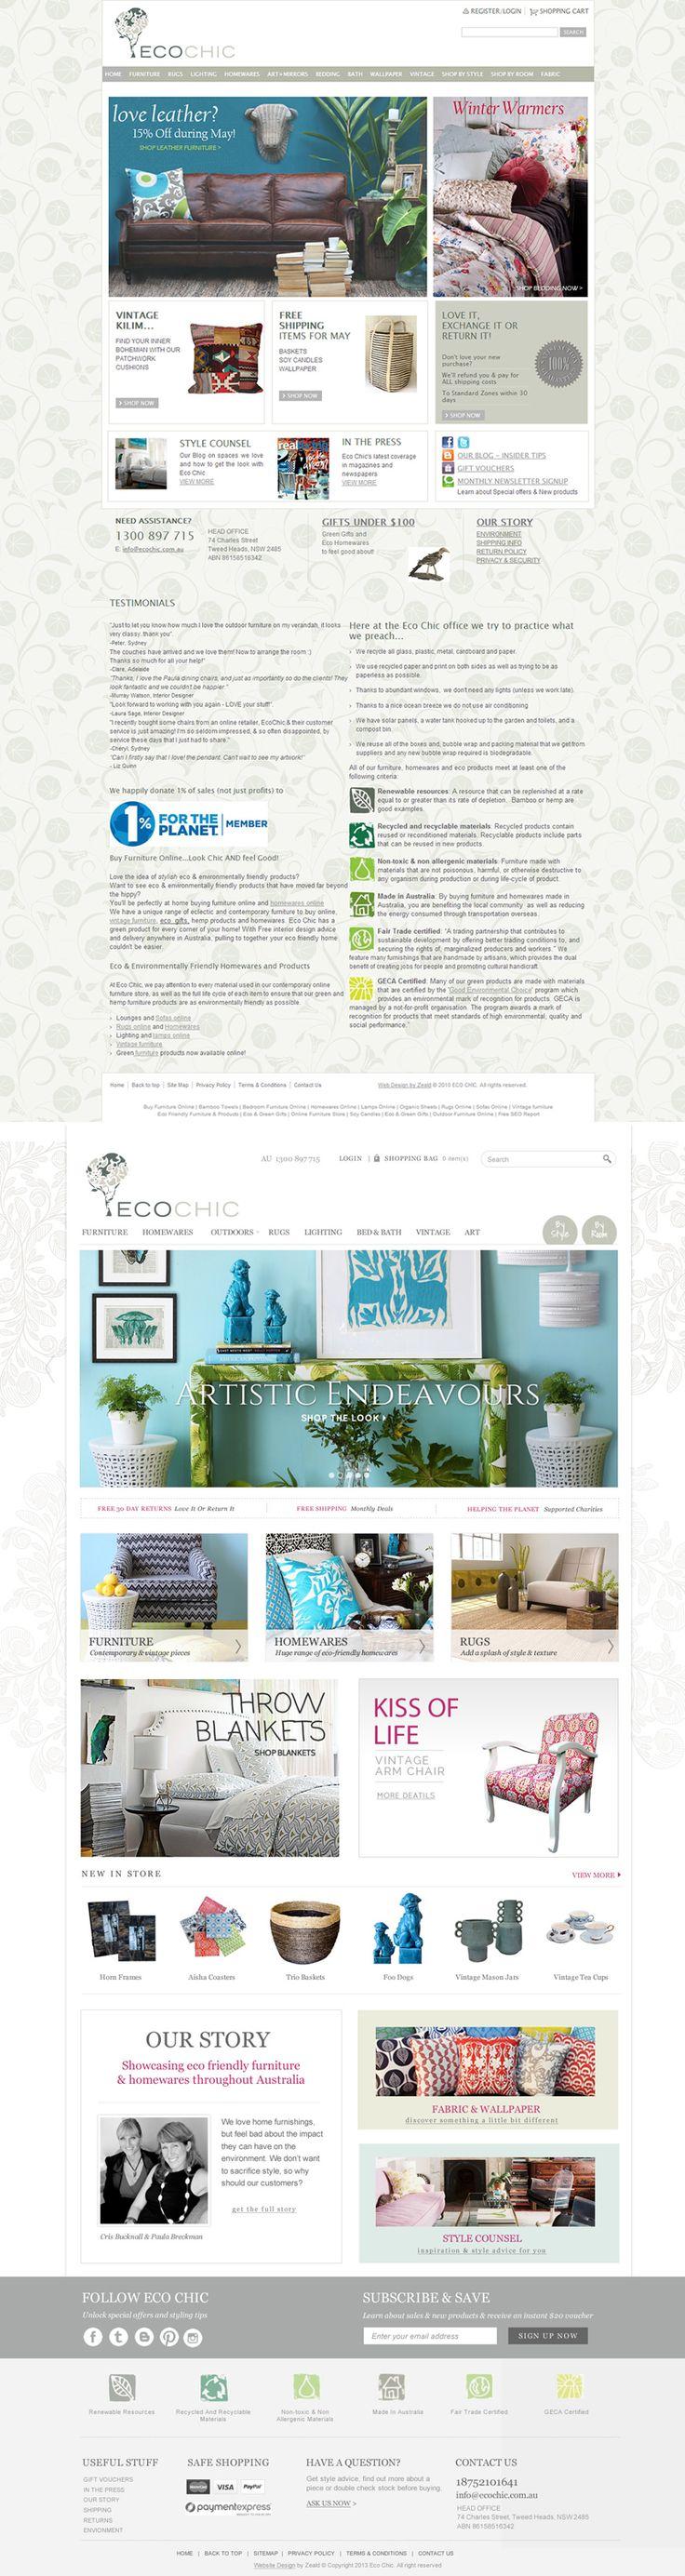 Eco Chic Website Redesign